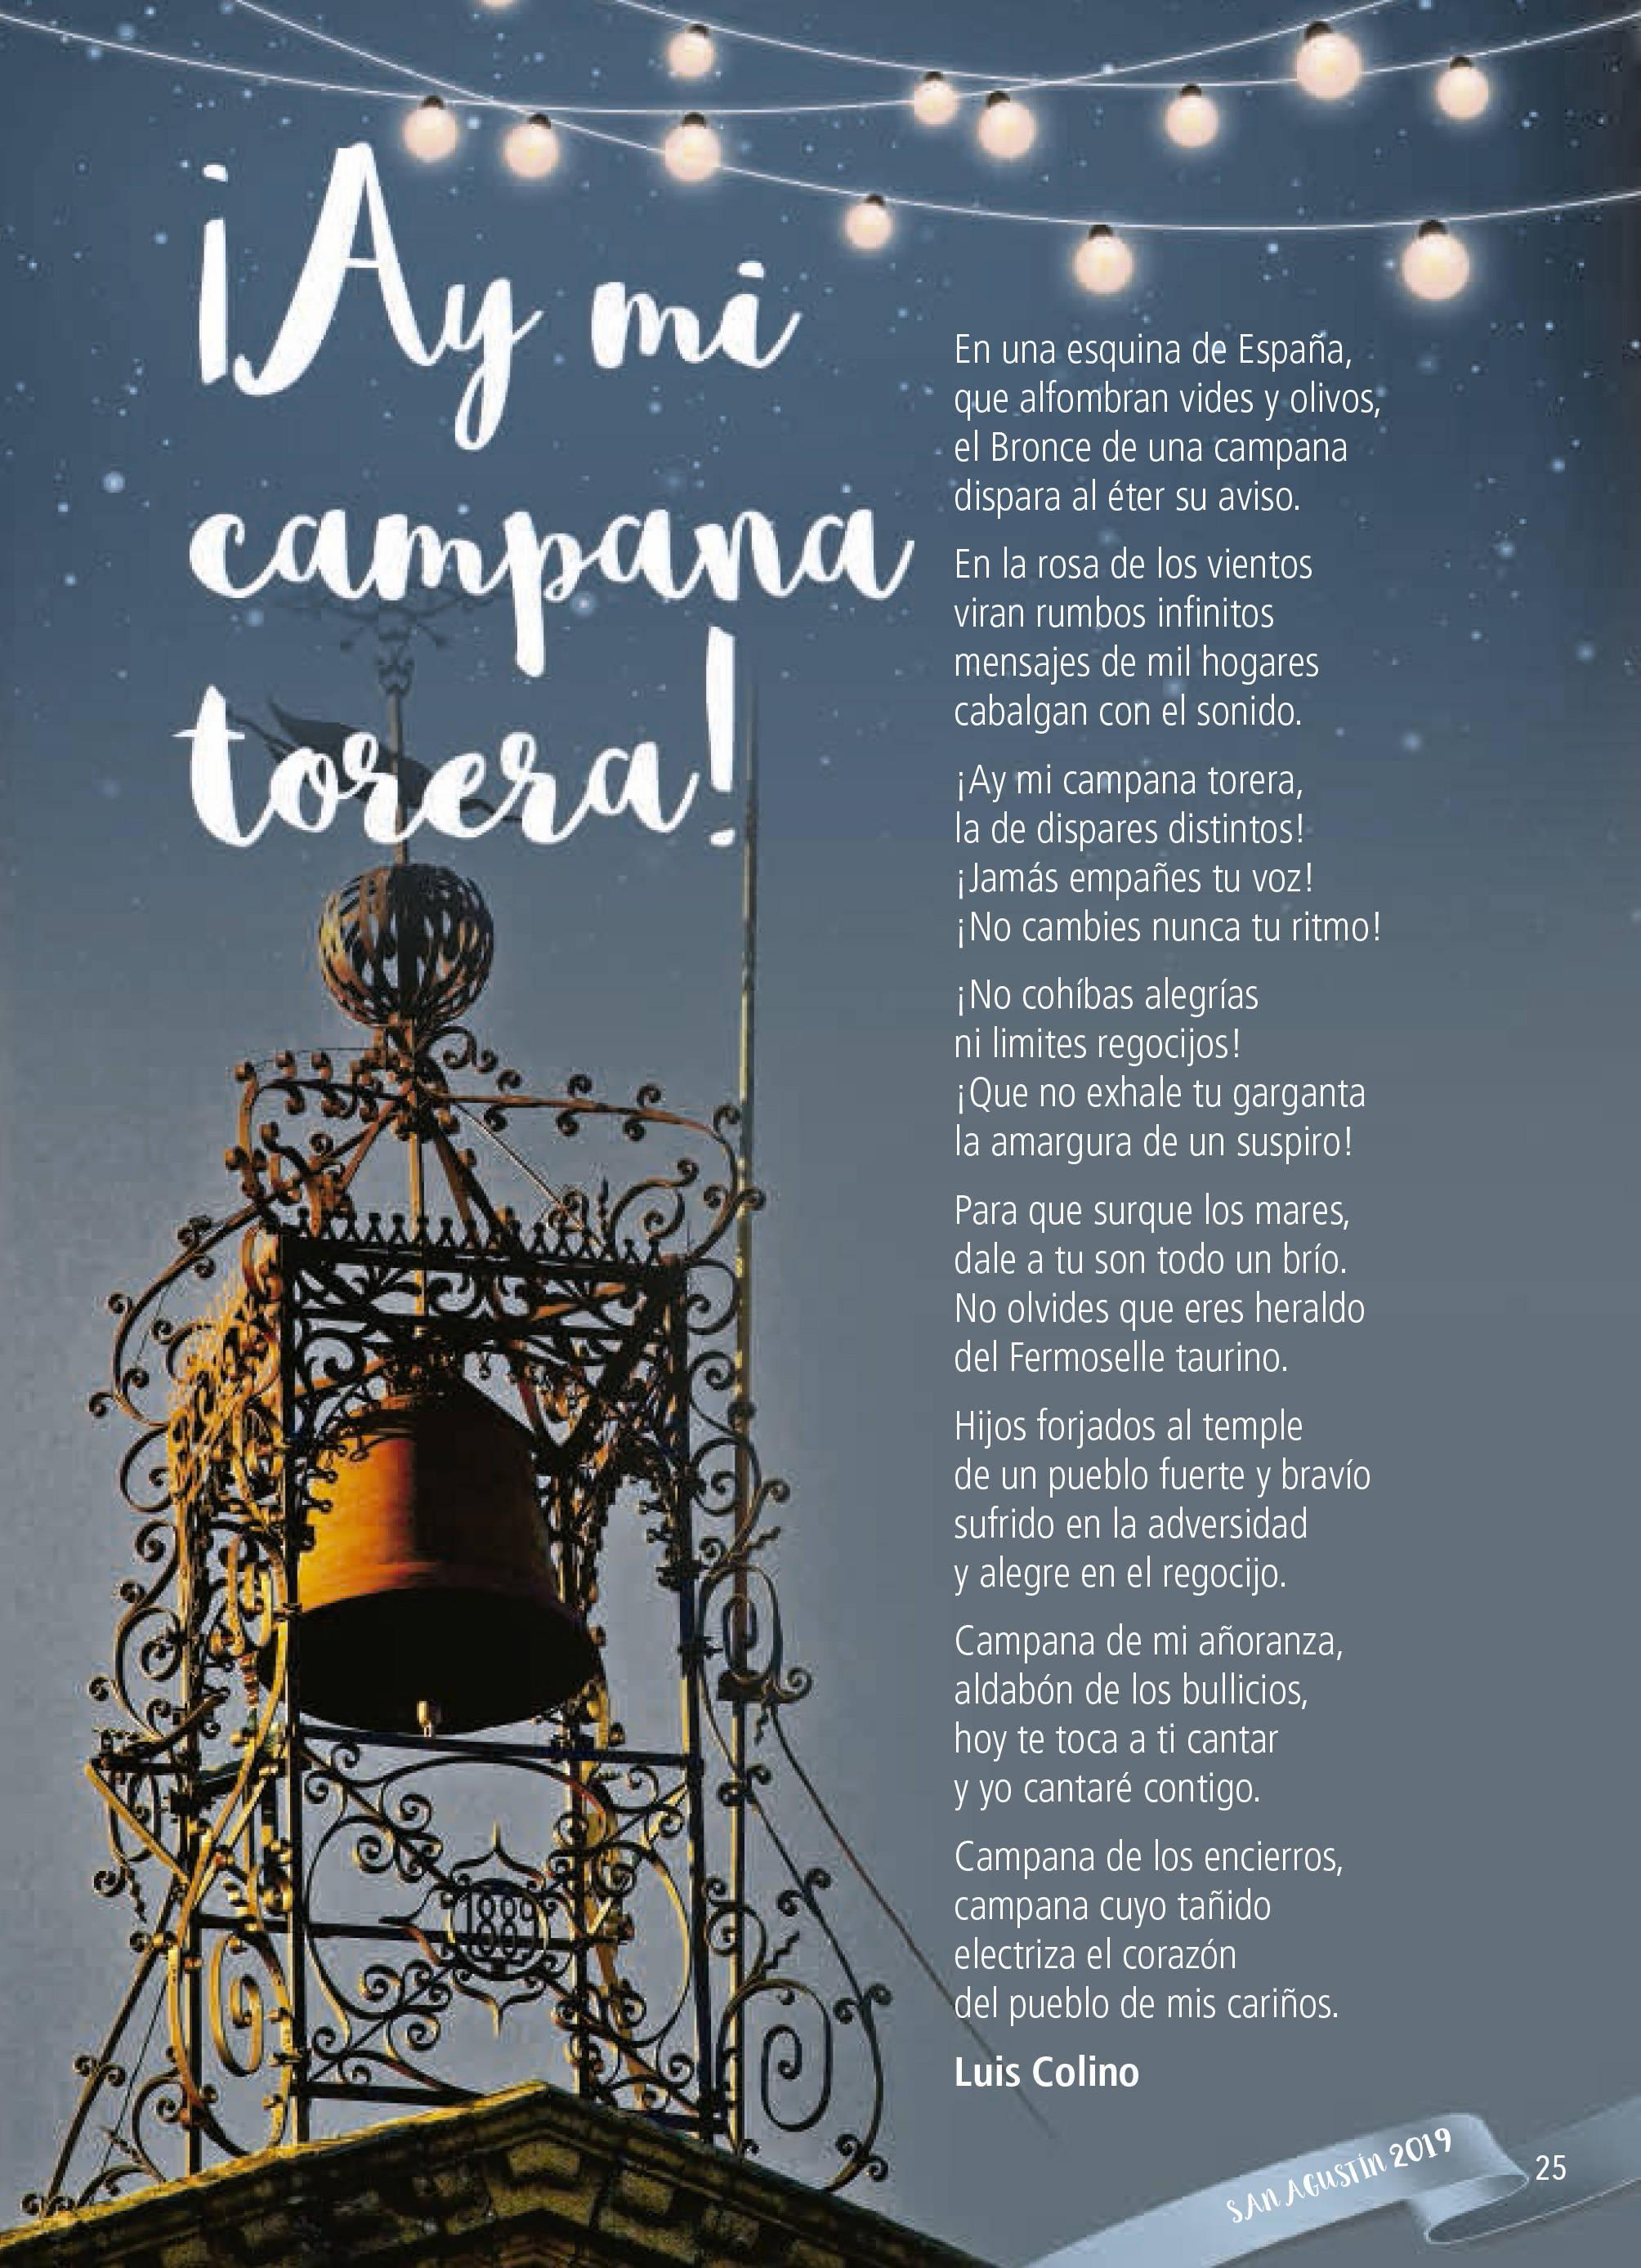 Programa de ferias y fiestas 2019 - Fermoselle (Zamora) 7